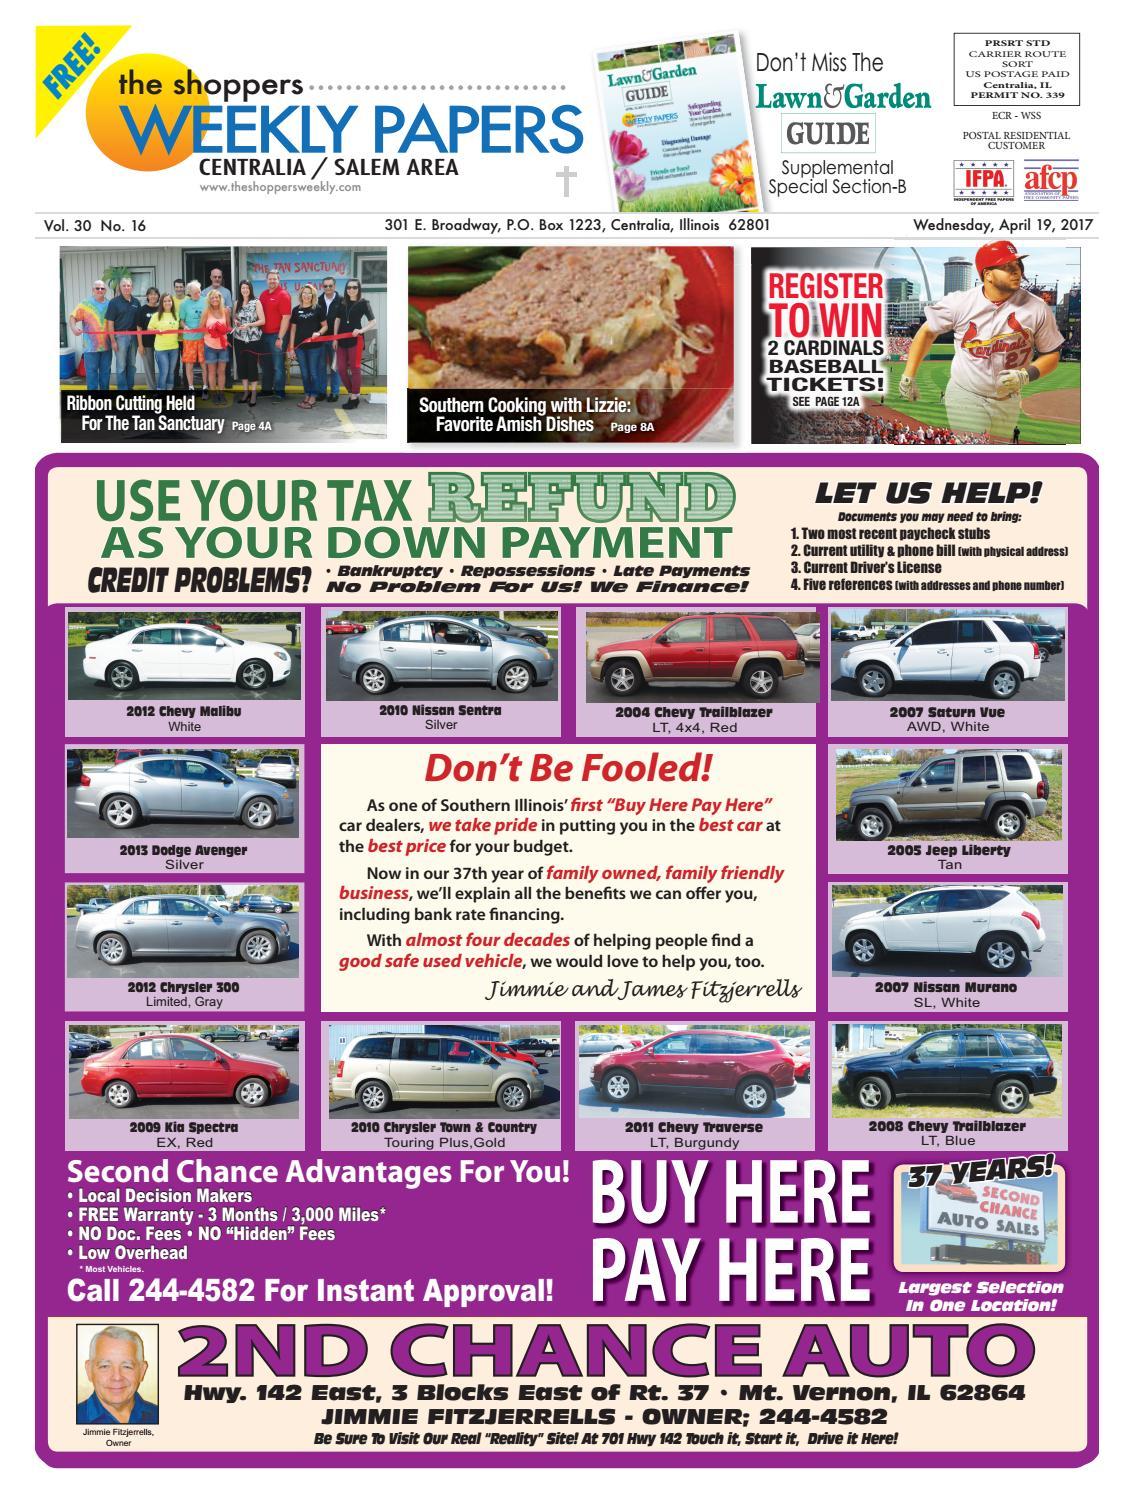 ac34885f3 The Shopper's Weekly - Centralia/Salem Area